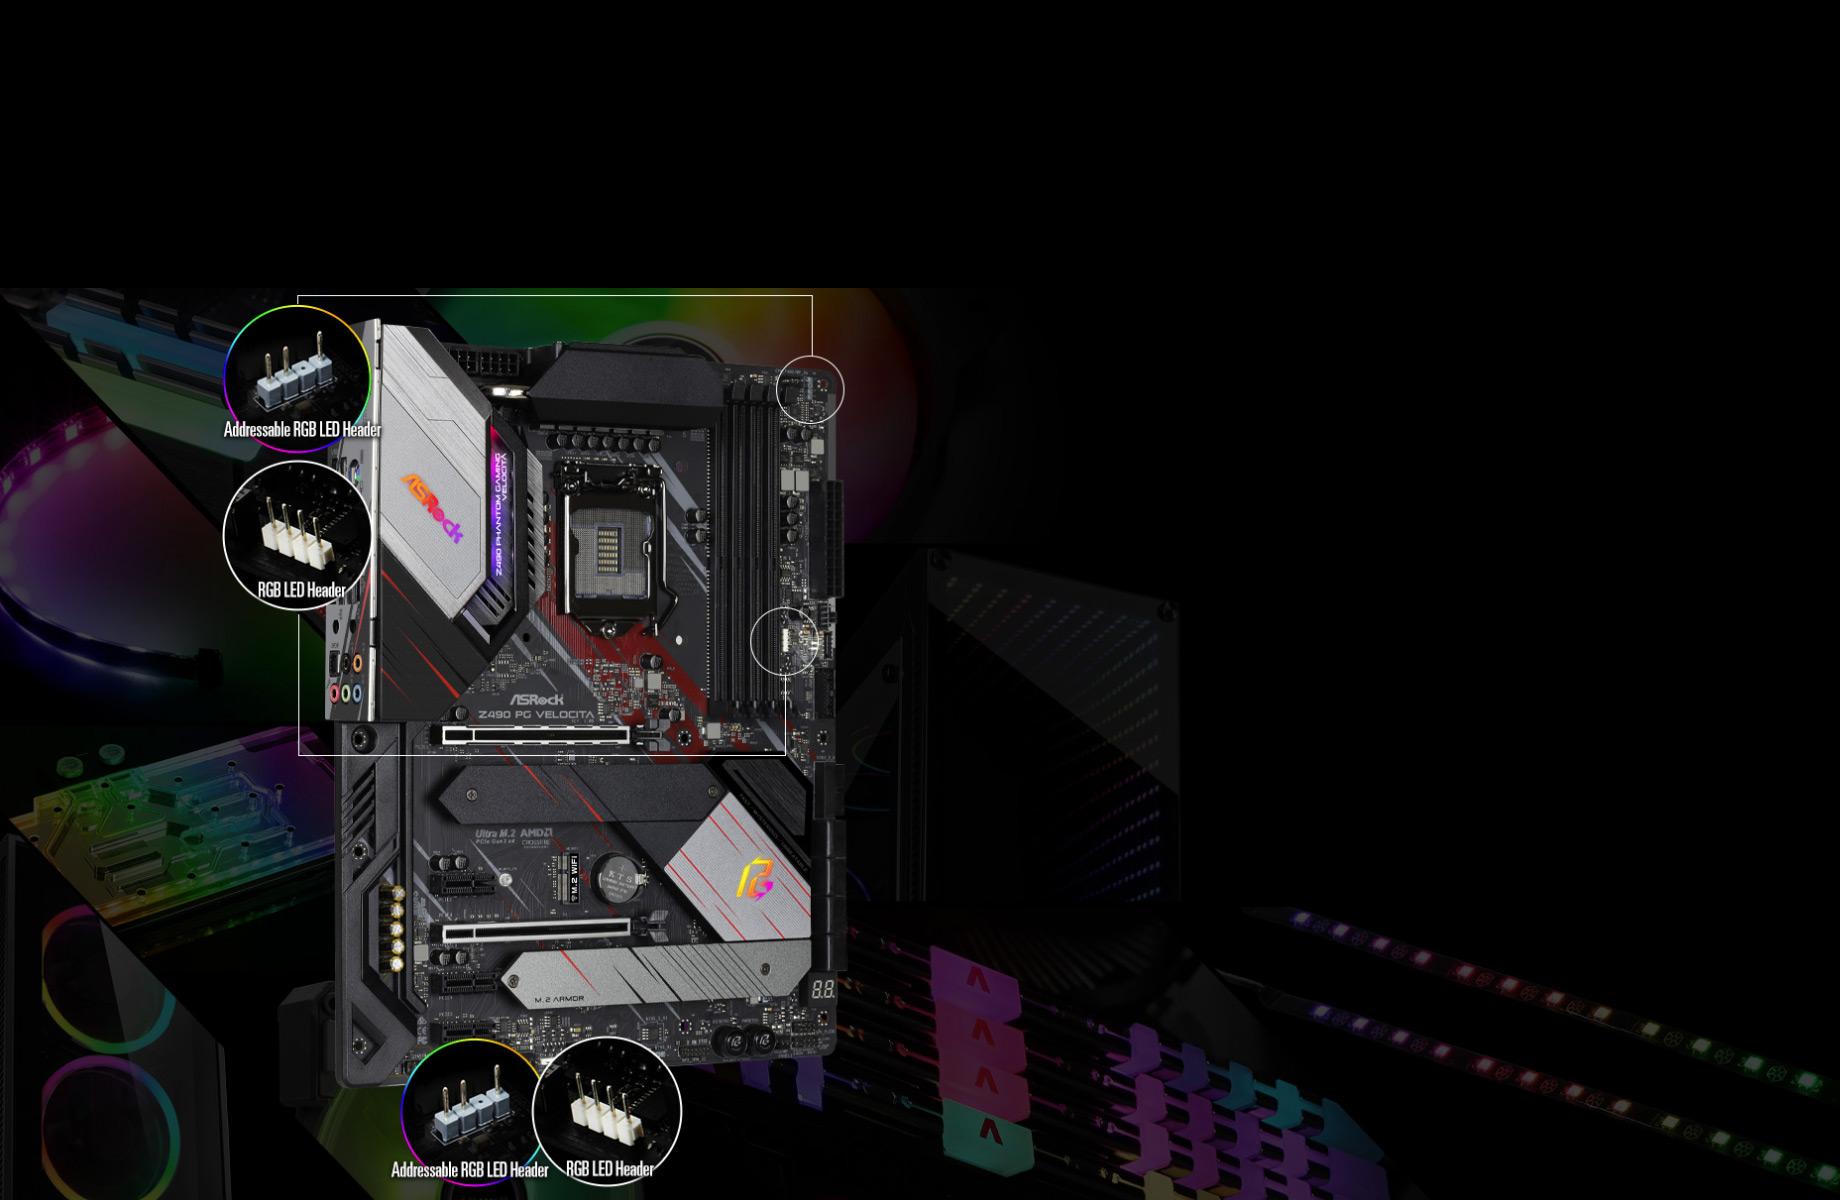 POLYRGBLED-X570 Phantom Gaming 4 WiFi ax